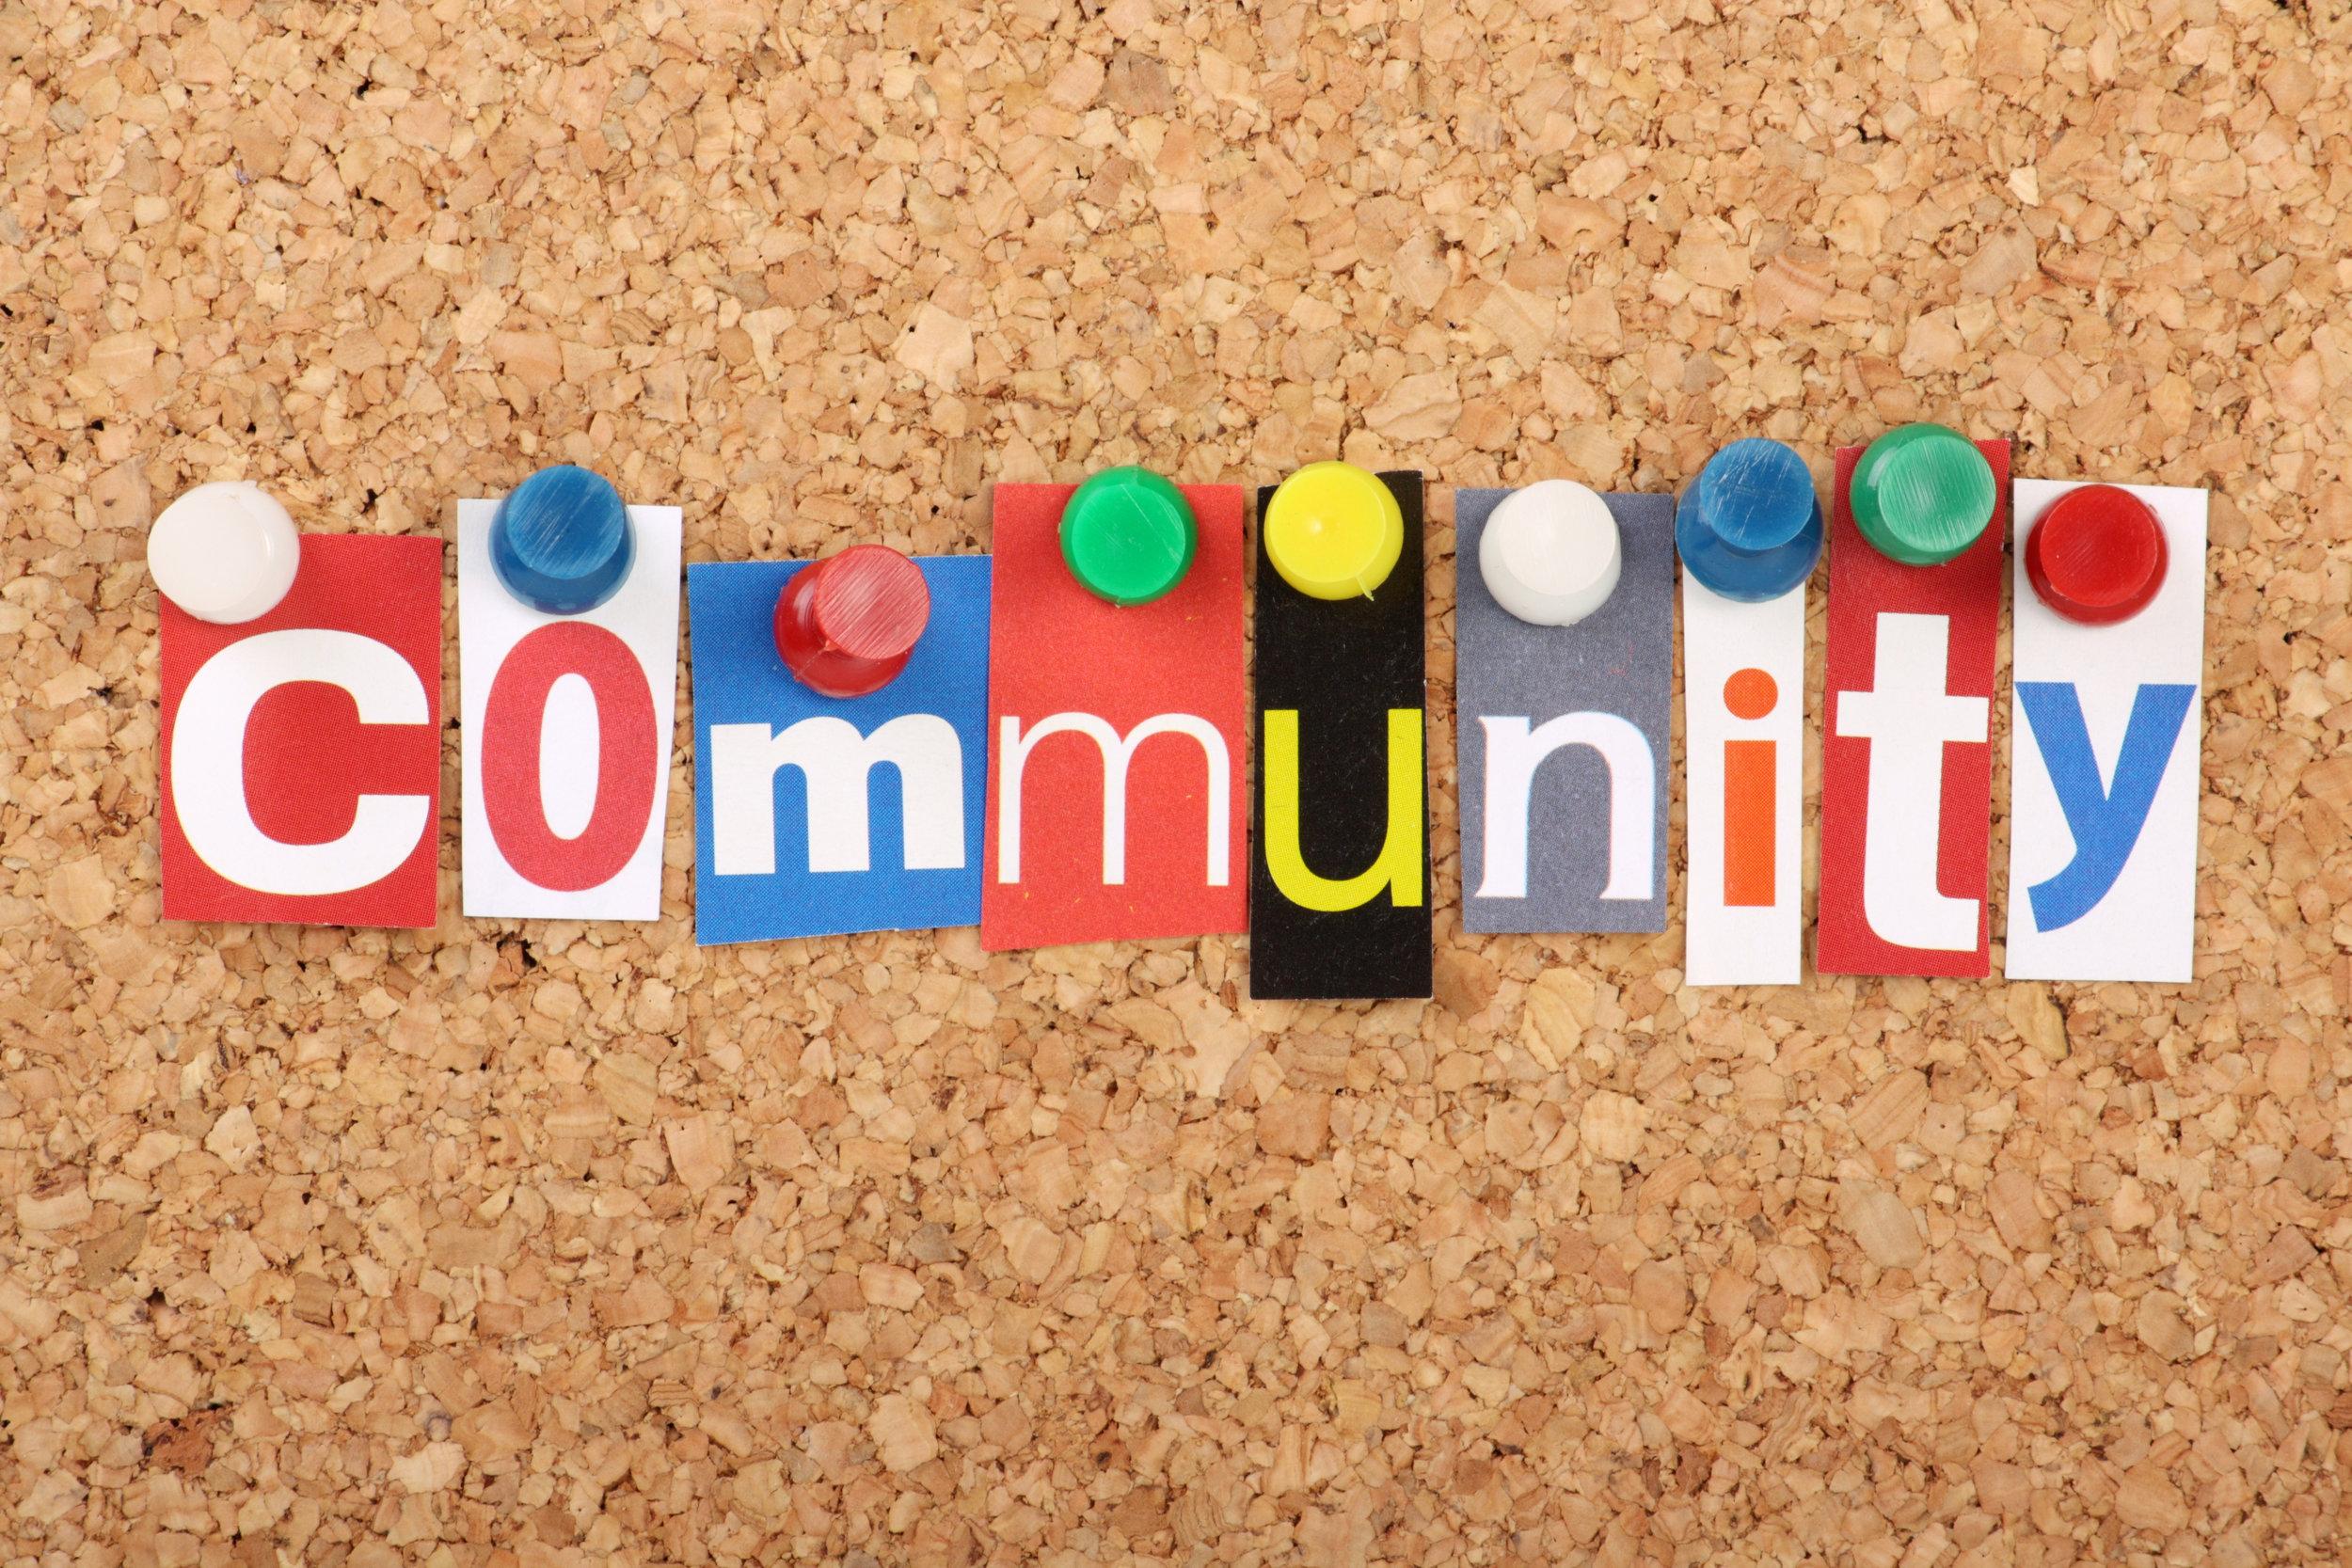 communitycollaborative_final.jpg